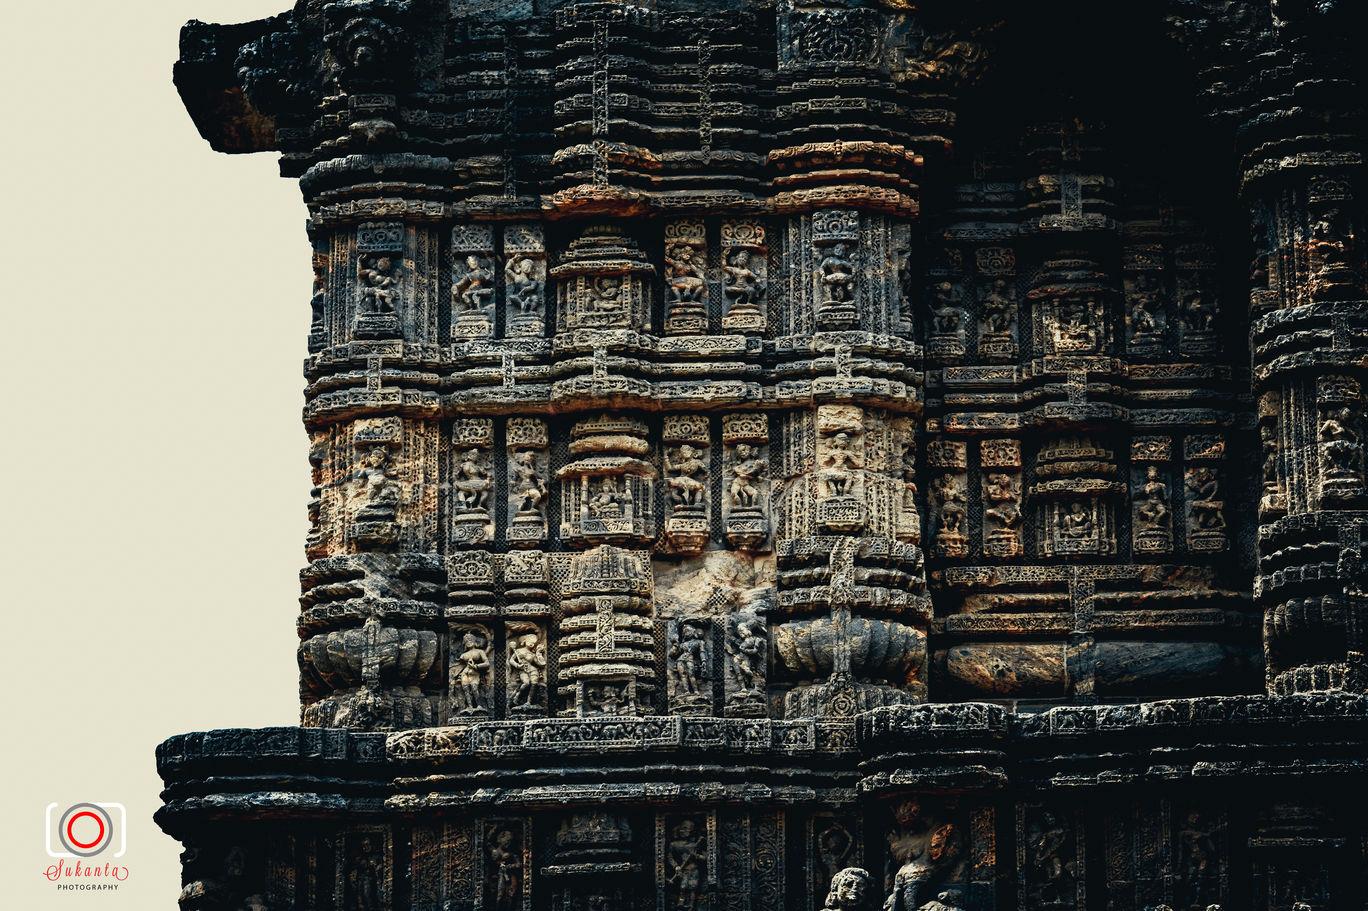 Photo of Ancient Ruins & Temples - Konarak Sun Temple By Sukanta Maity